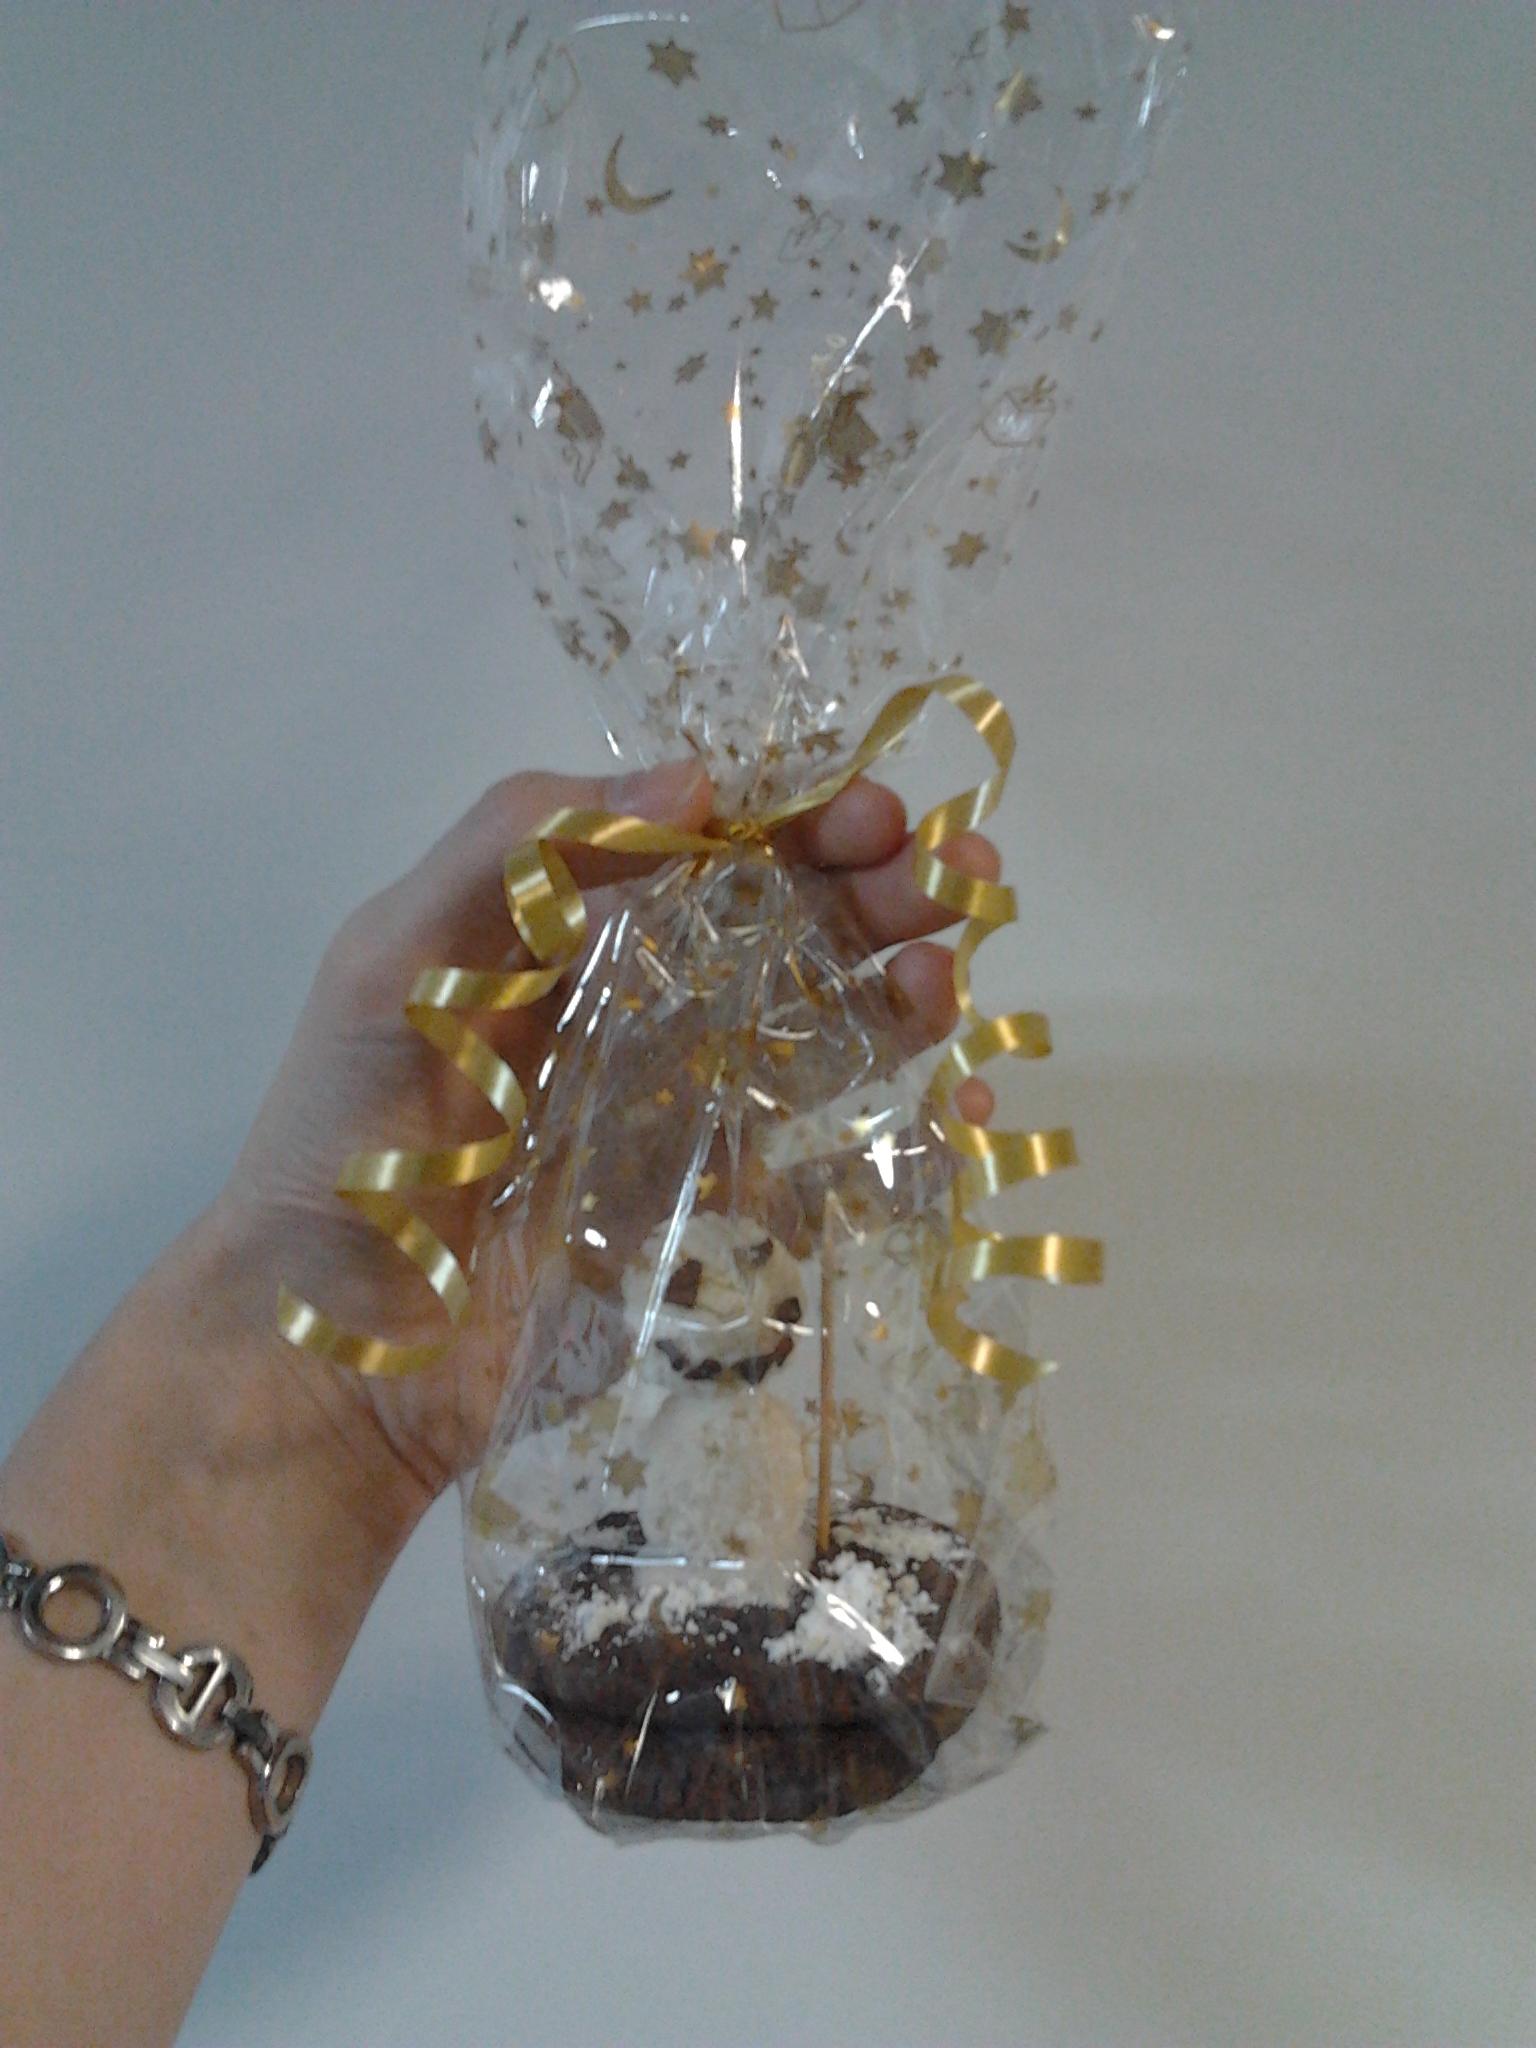 Triple-Chocolate-Cookies als Weihnachtsgeschenk